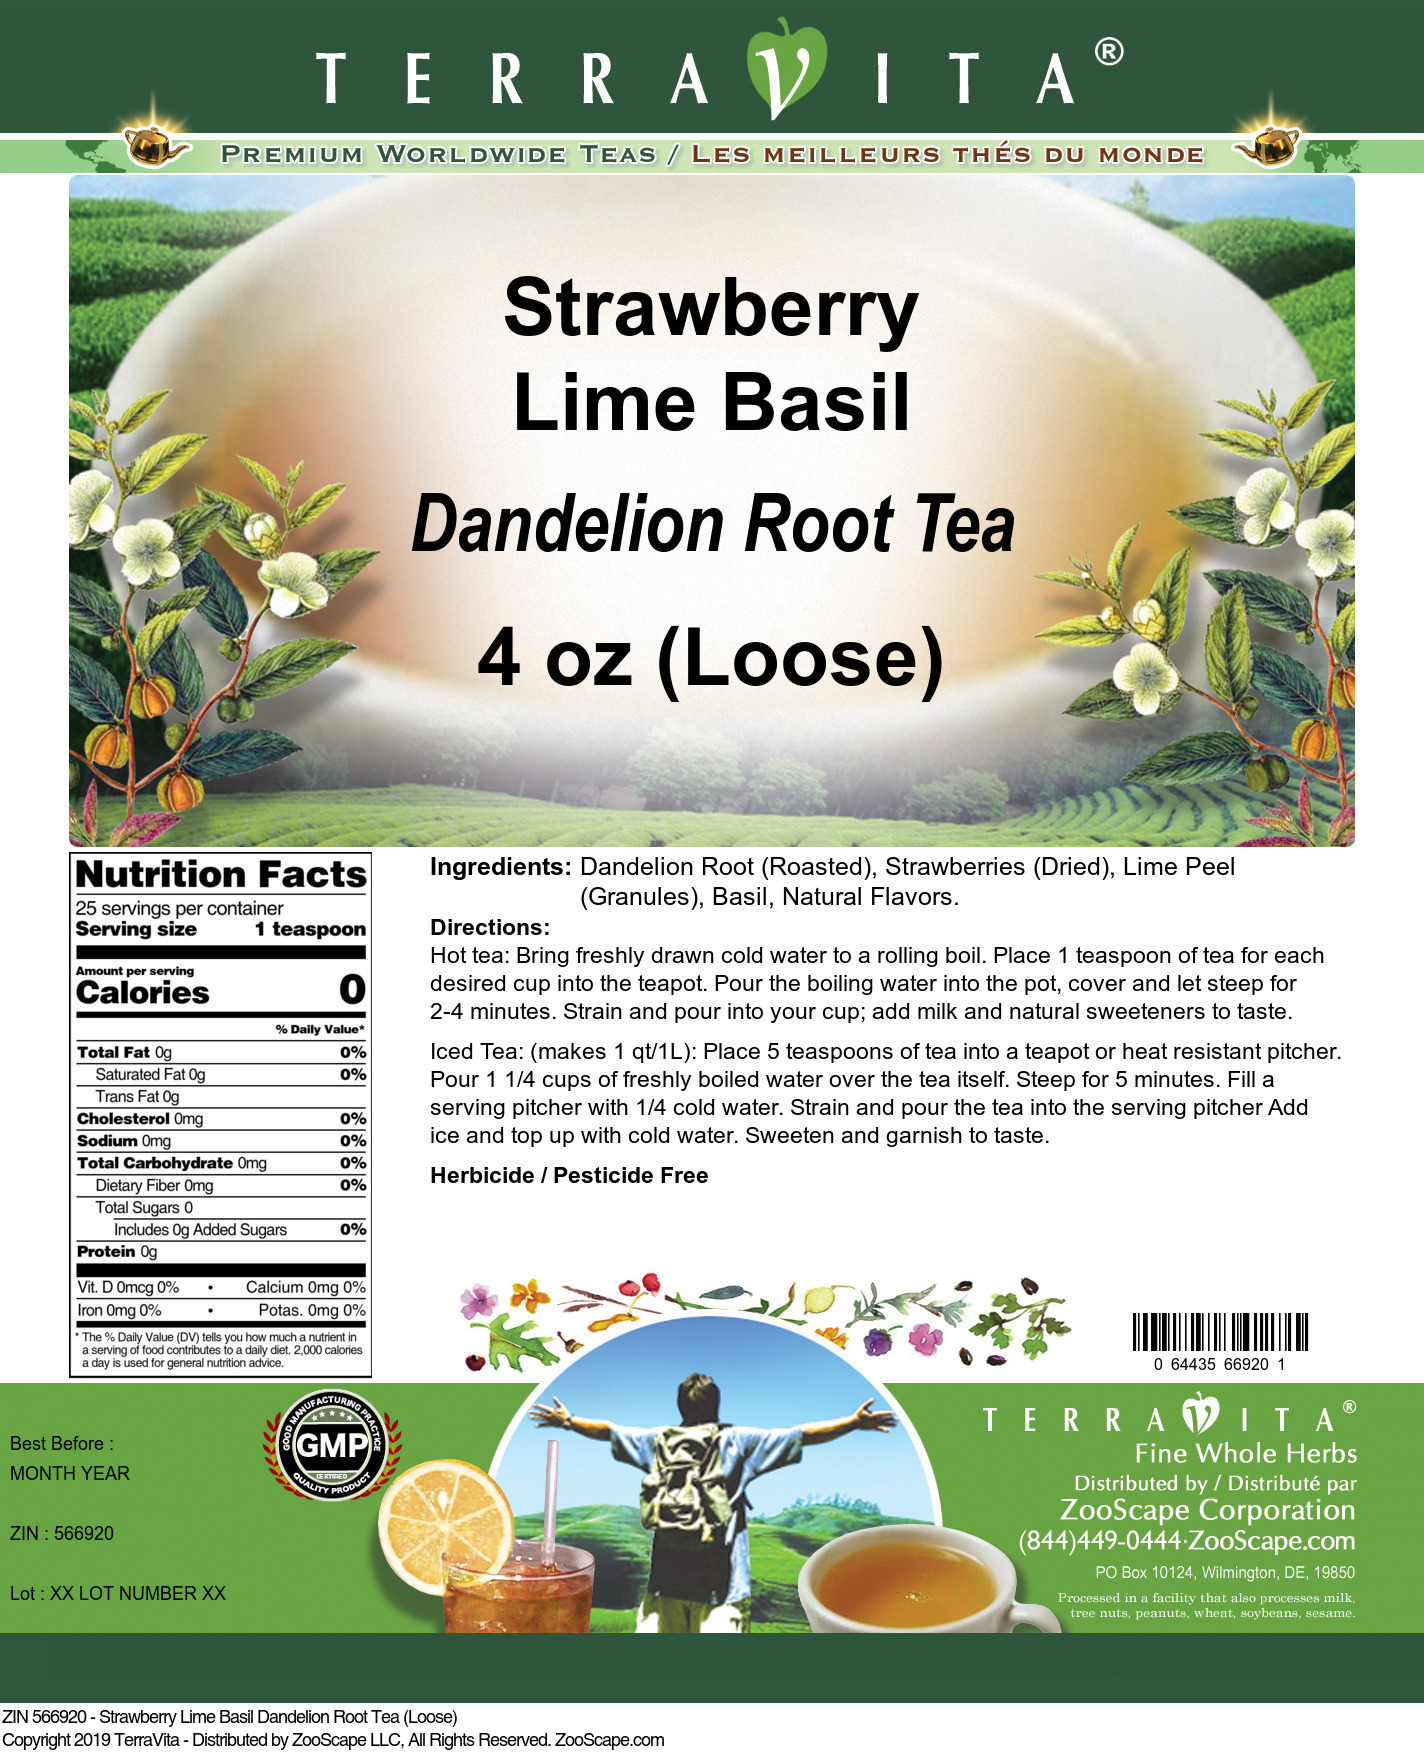 Strawberry Lime Basil Dandelion Root Tea (Loose)